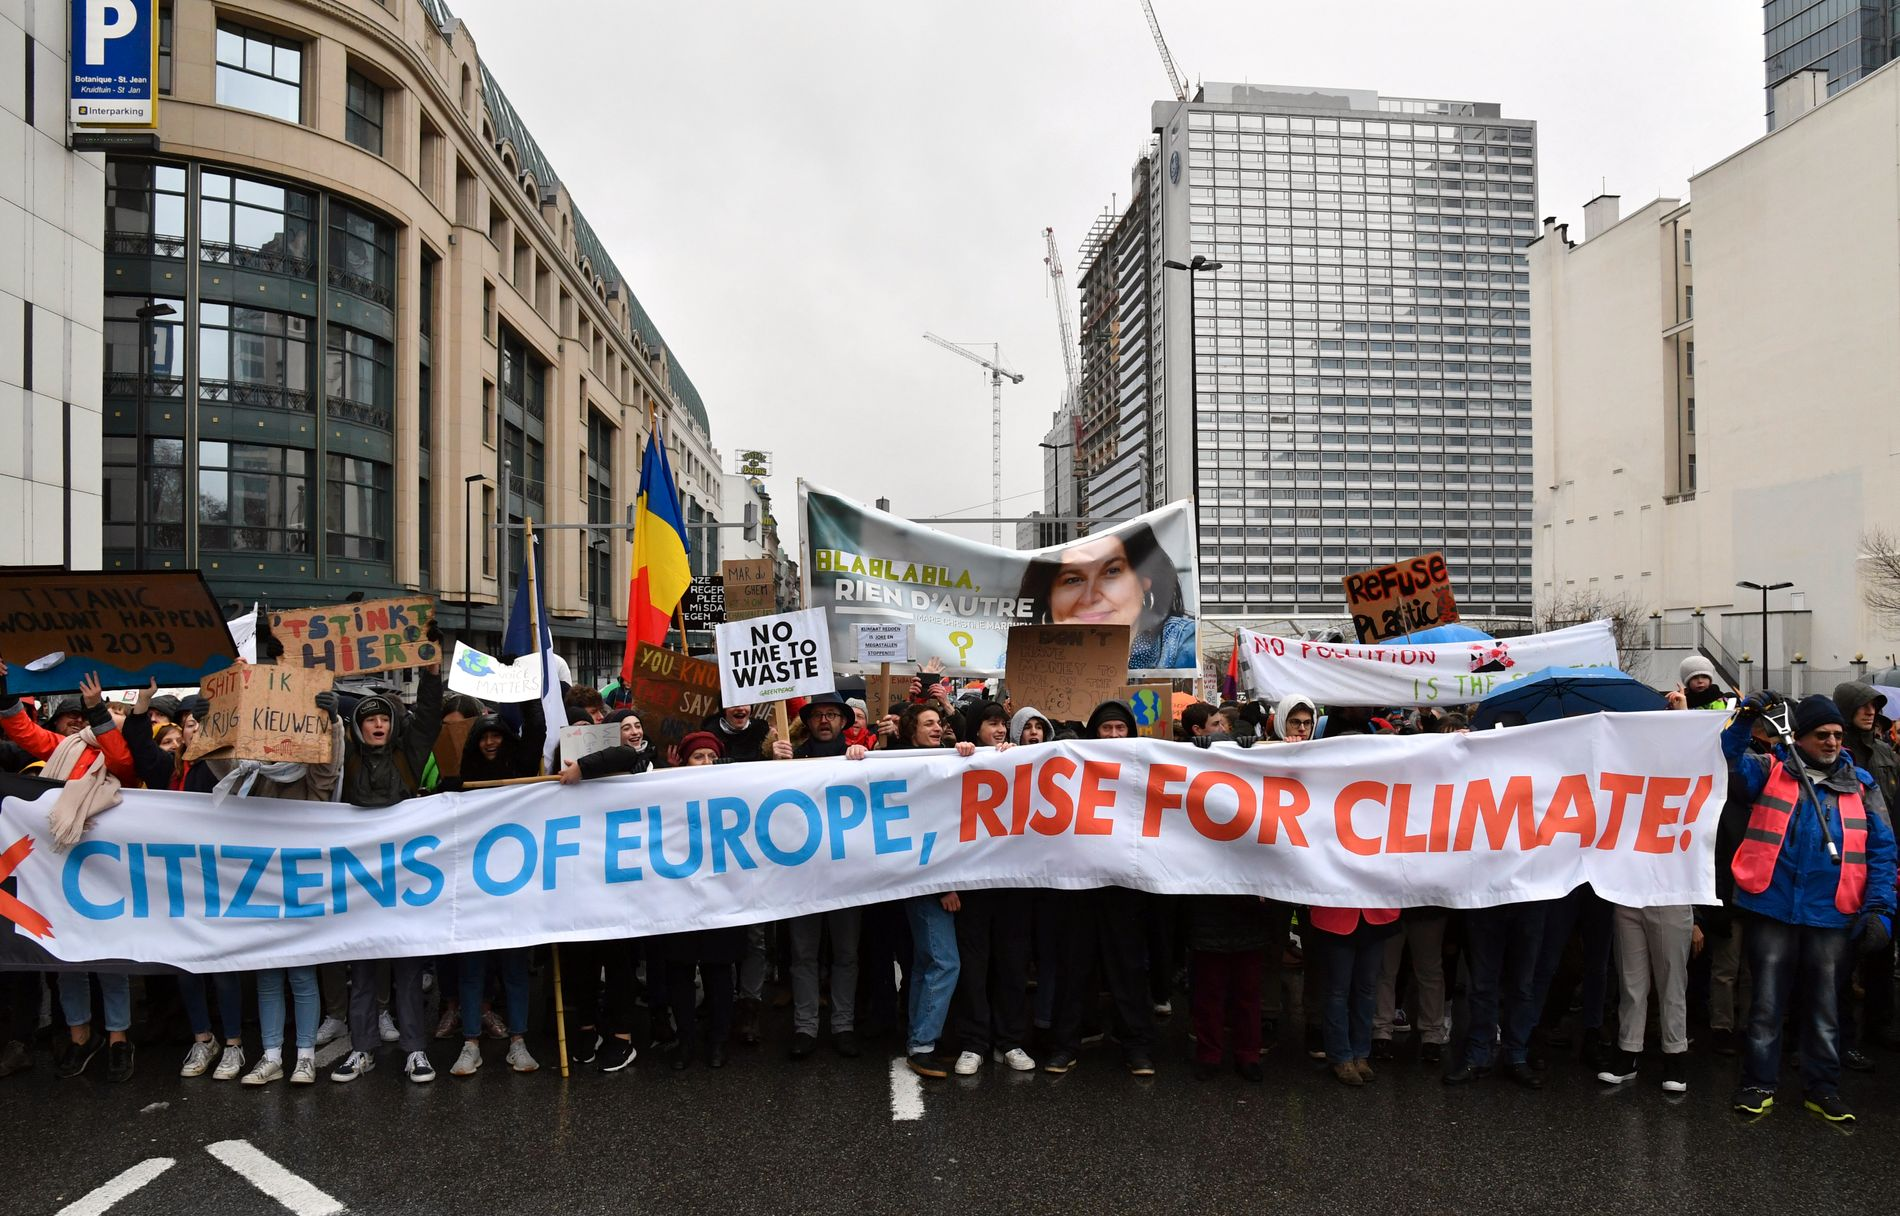 Over 70.000 møtte opp til klimamarsj i Brussel søndag. Foto: Geert Vanden Wijngaert / AP / NTB scanpix